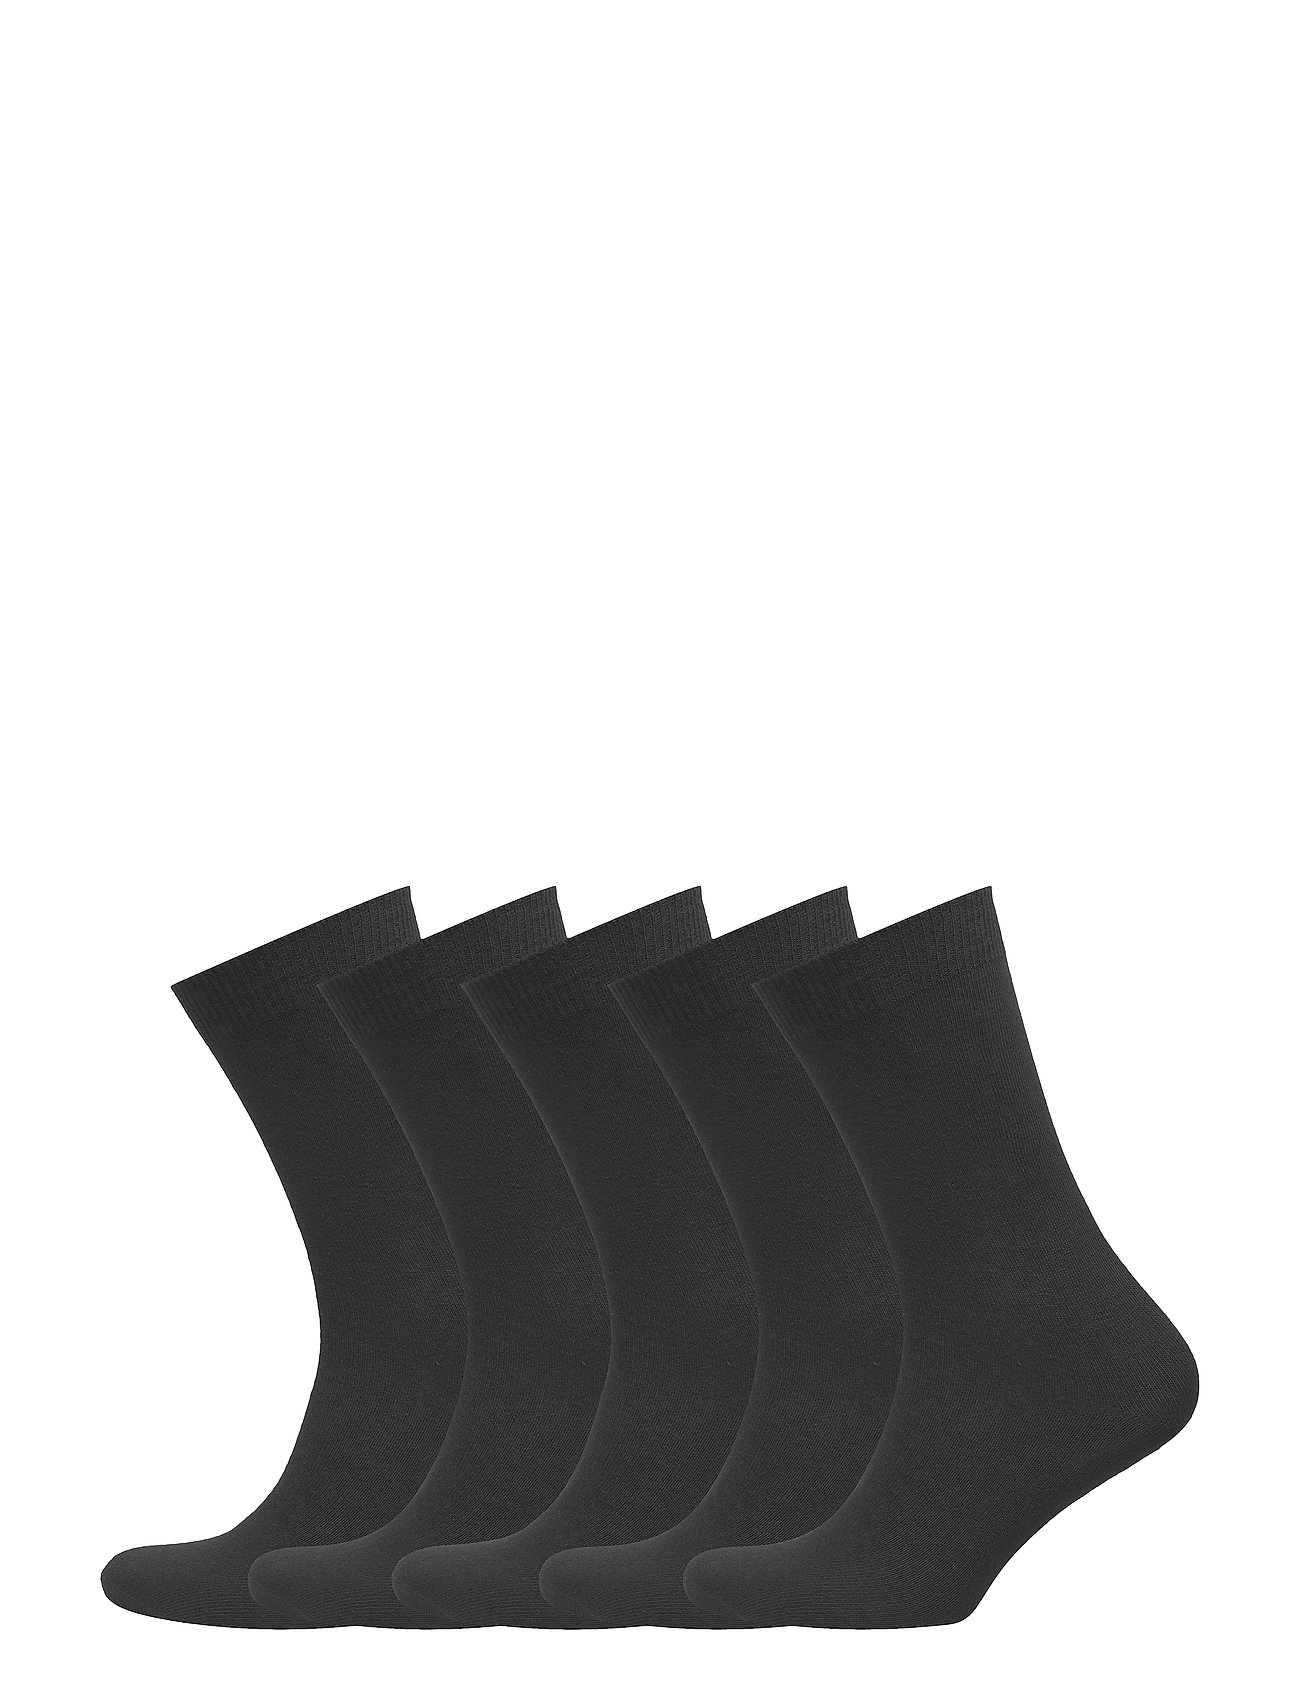 5 Ankle pkblack Sock Decoy Cotton 34R5ALjq